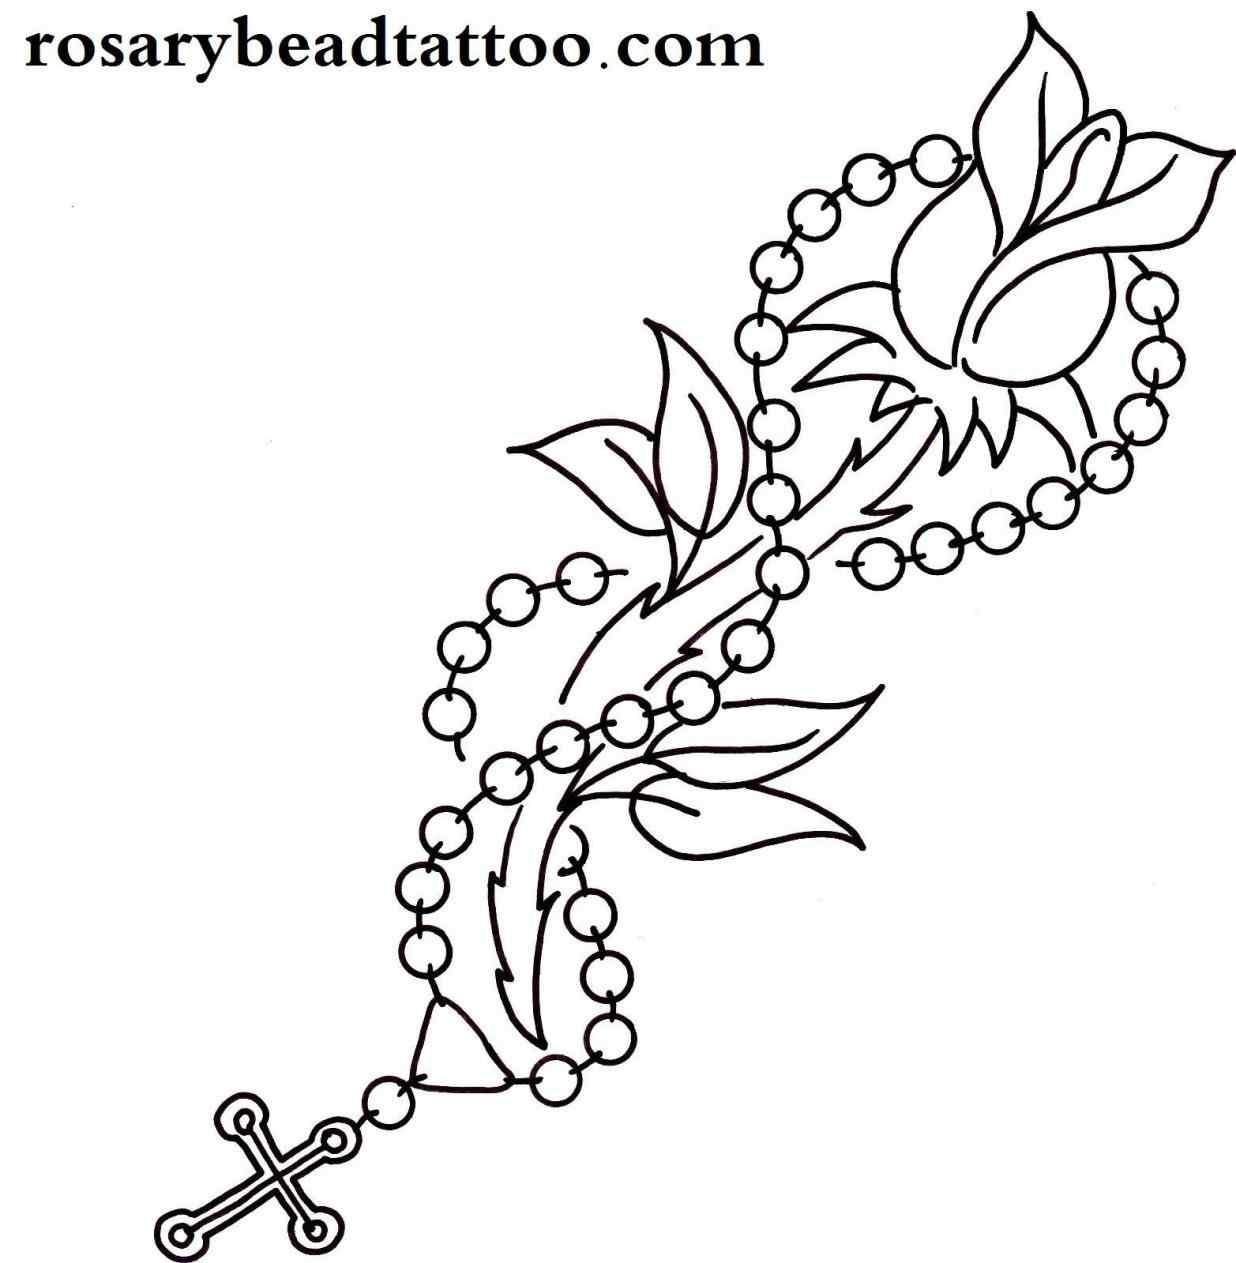 1236x1263 Hearts And Roses And Stars Drawings Freespywarefixescom